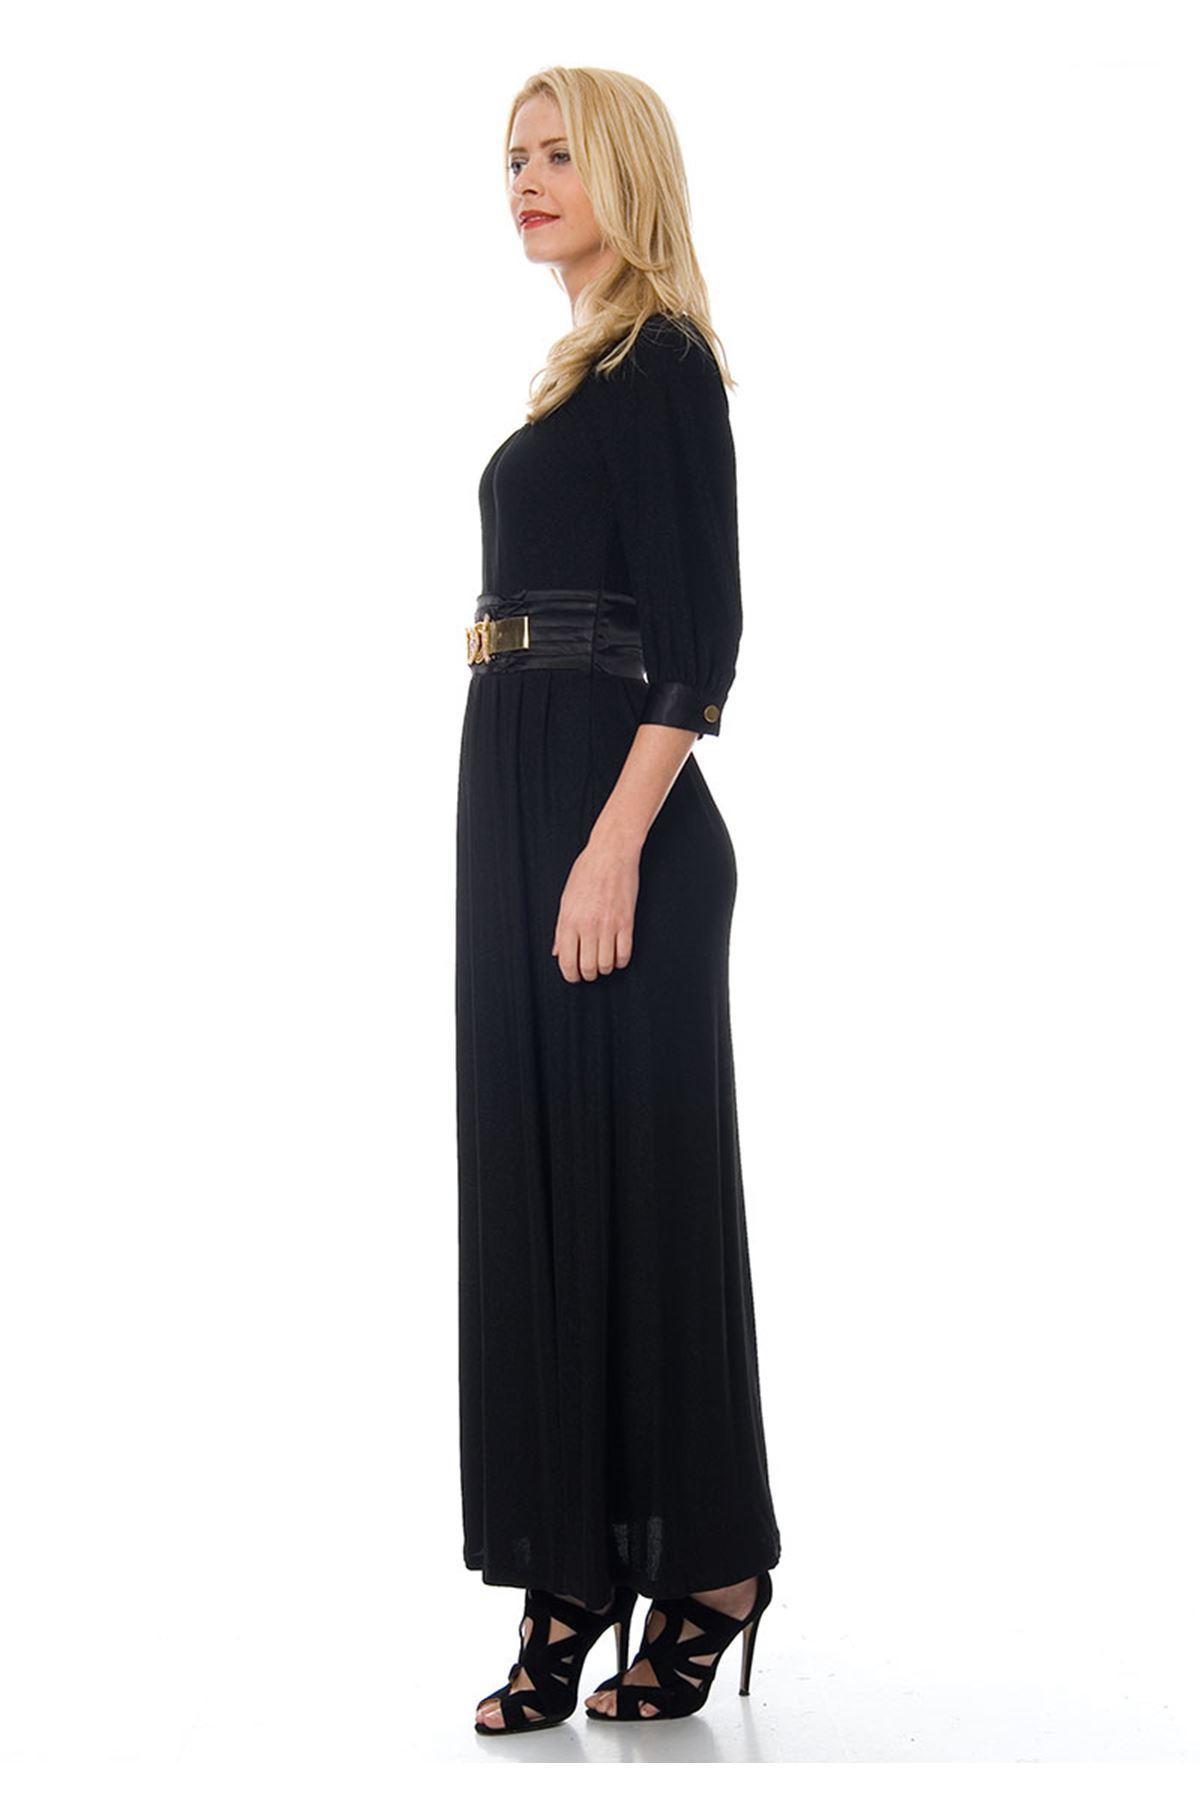 Siyah Şık Kemerli Elbise F1-103856